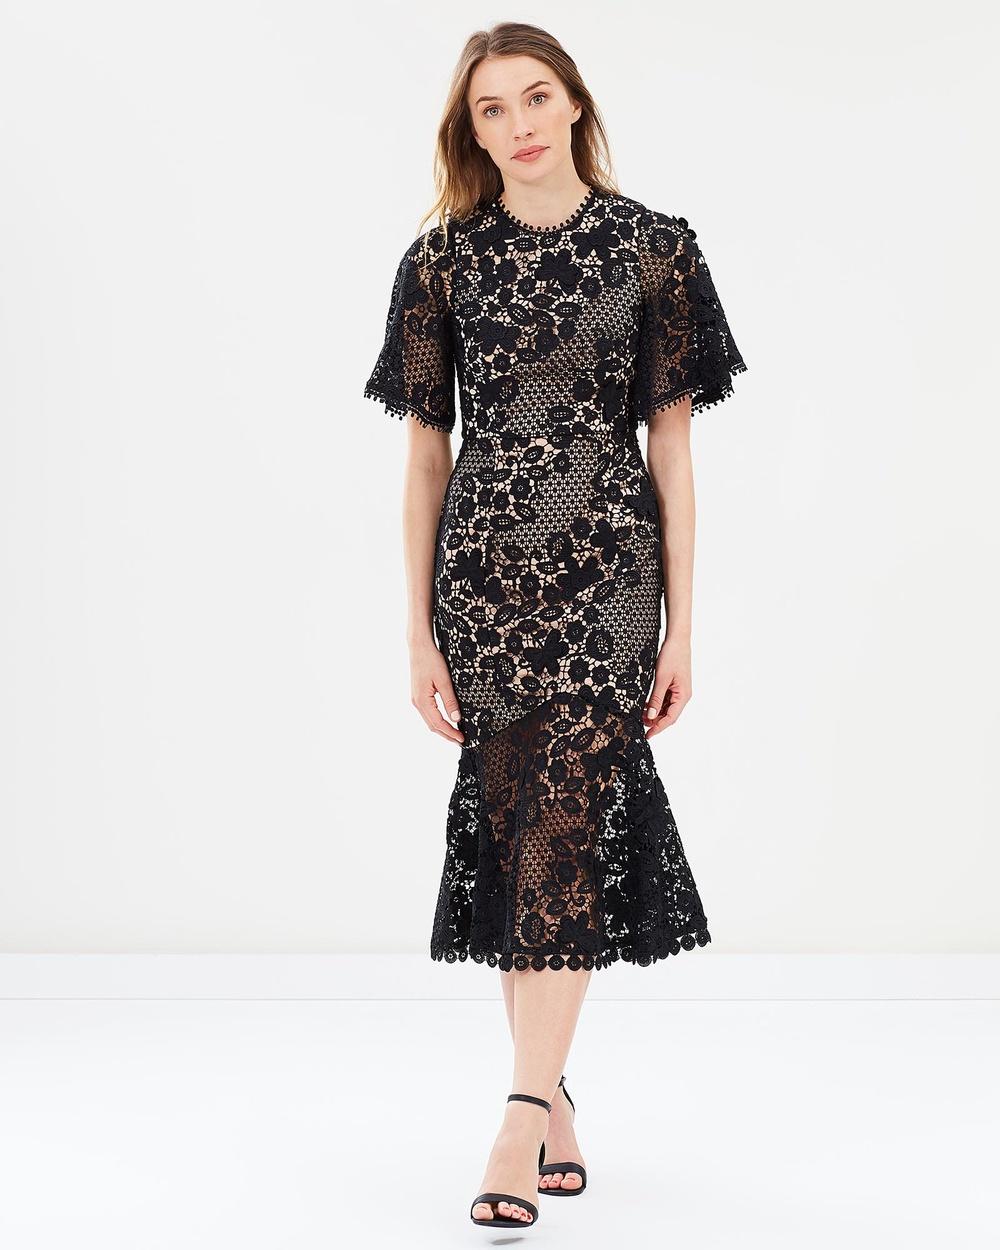 Love Honor Harper Lace Dress Bridesmaid Dresses Black Harper Lace Dress